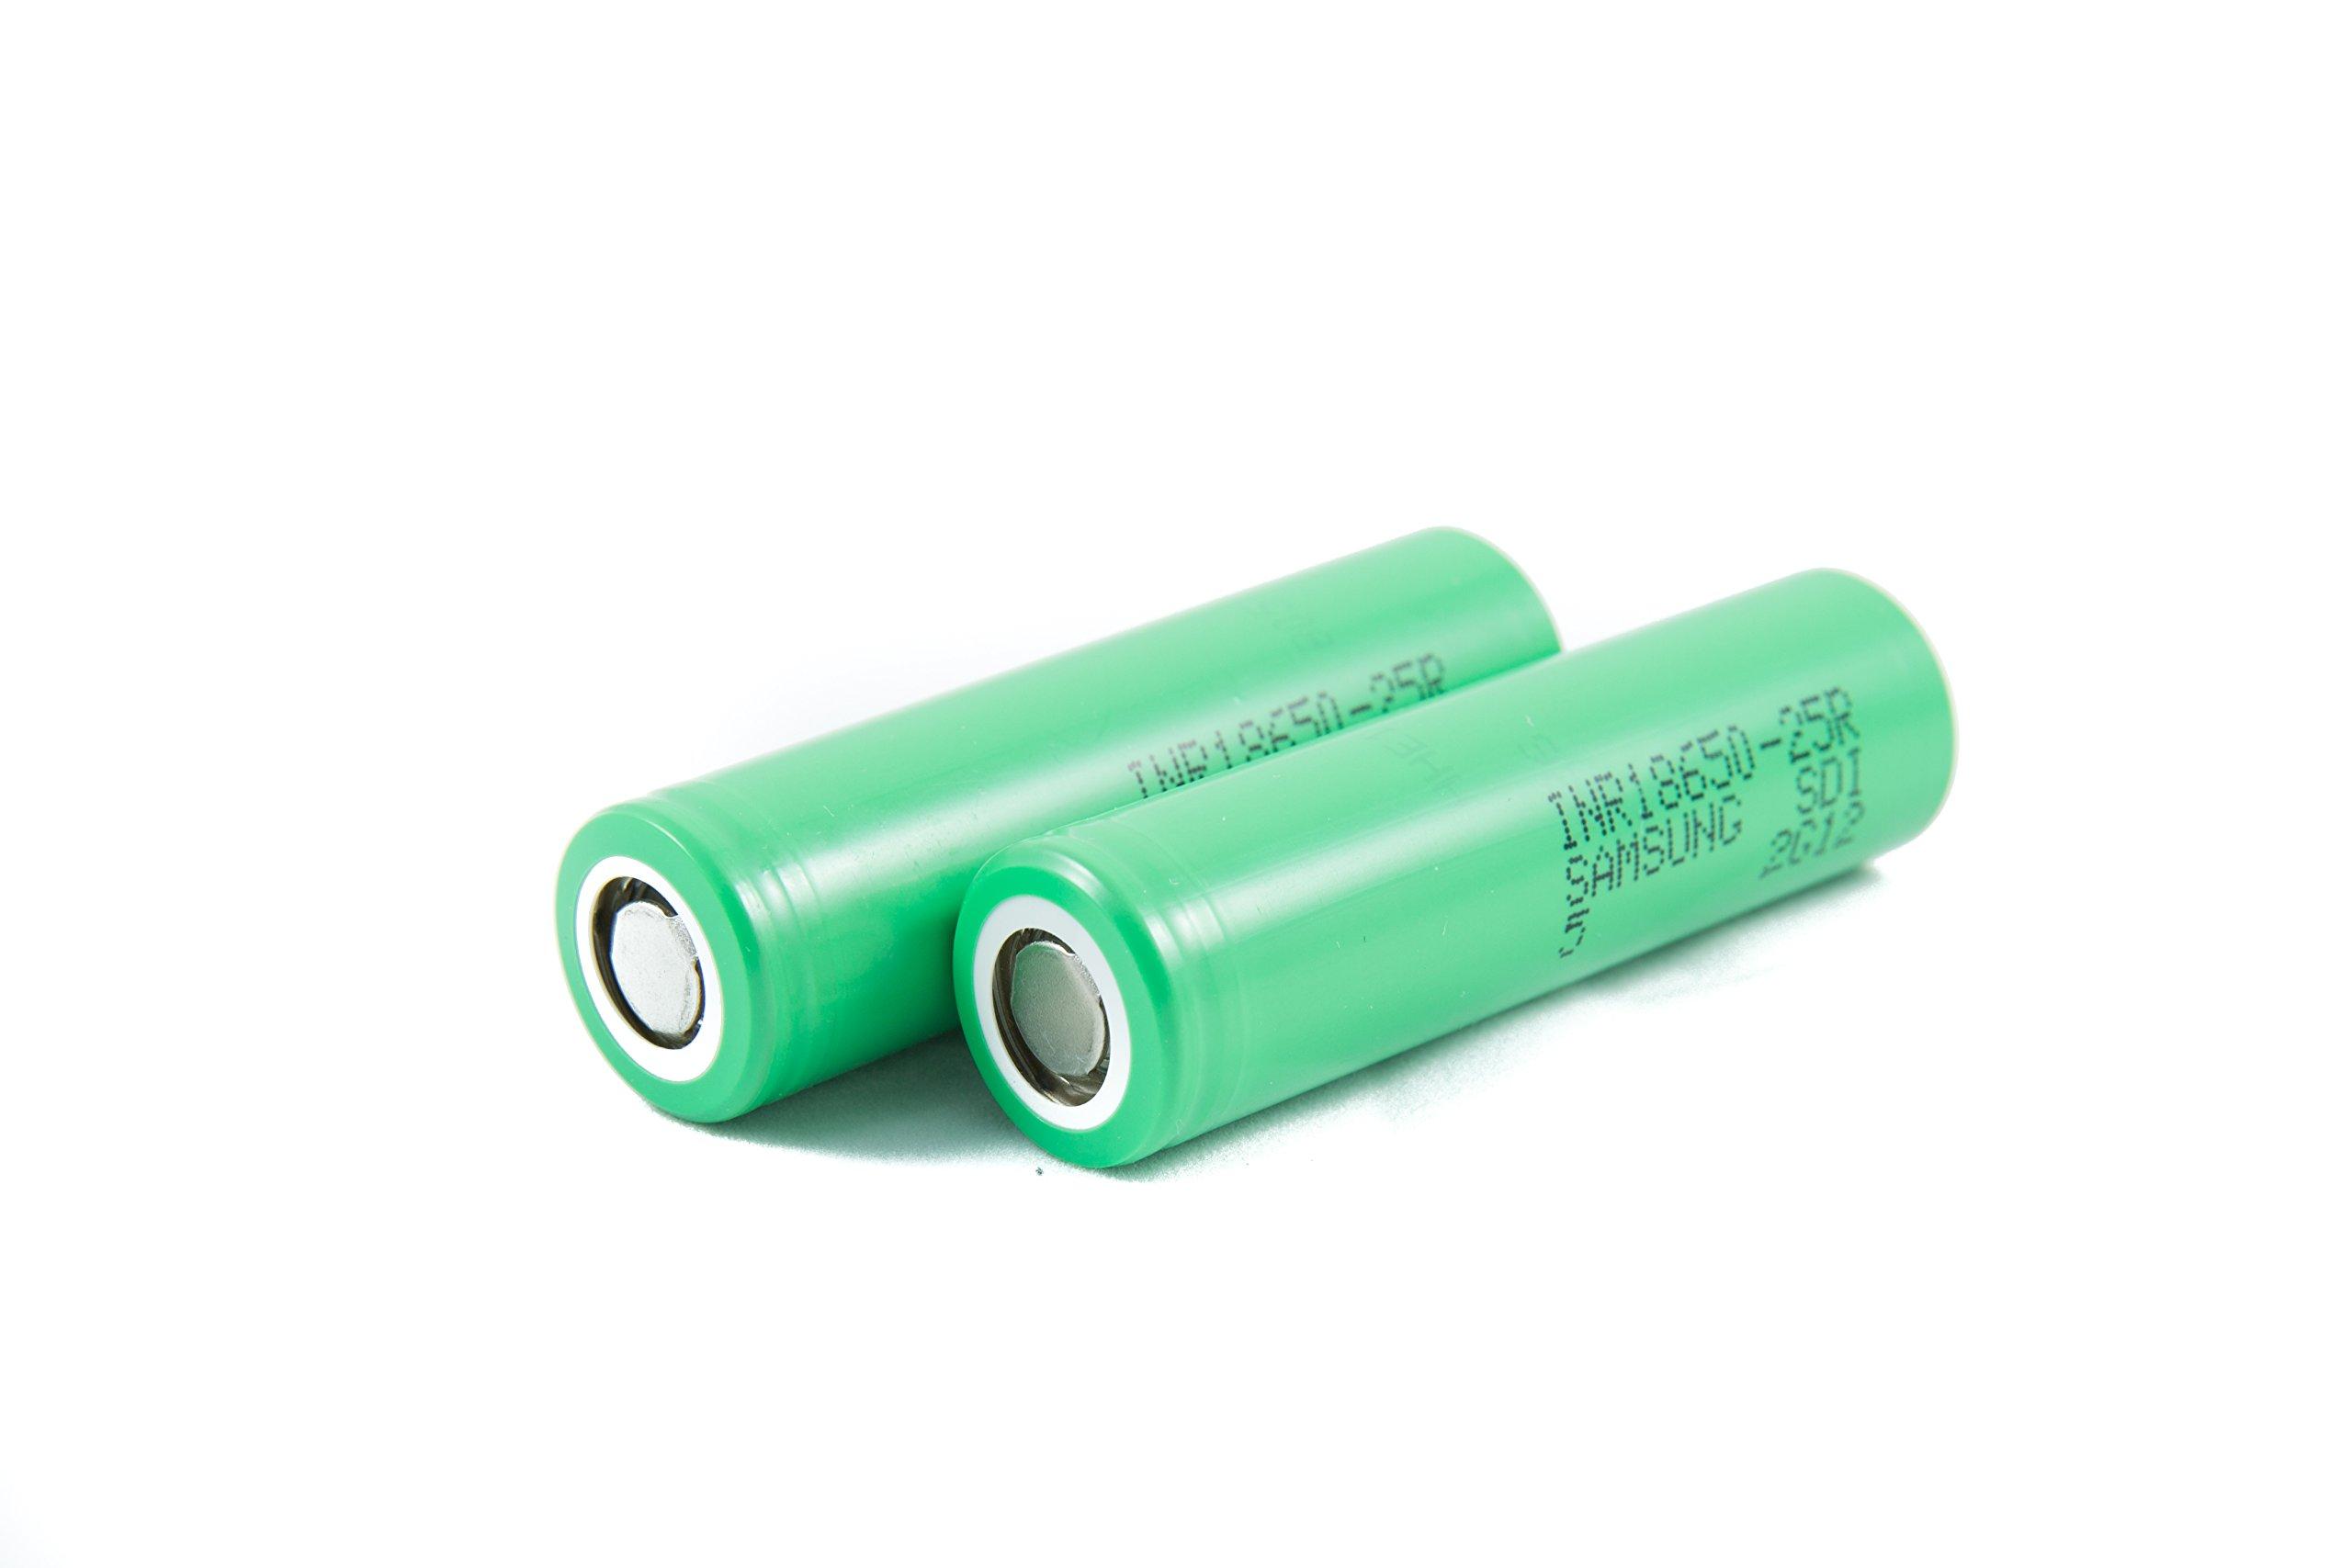 2pcs Samsung INR18650-25R 18650 2500mAh 3.7v Li-ion 20A discharge Authentic Grade-A Guarantee by CTINAW HOBBY (Image #5)